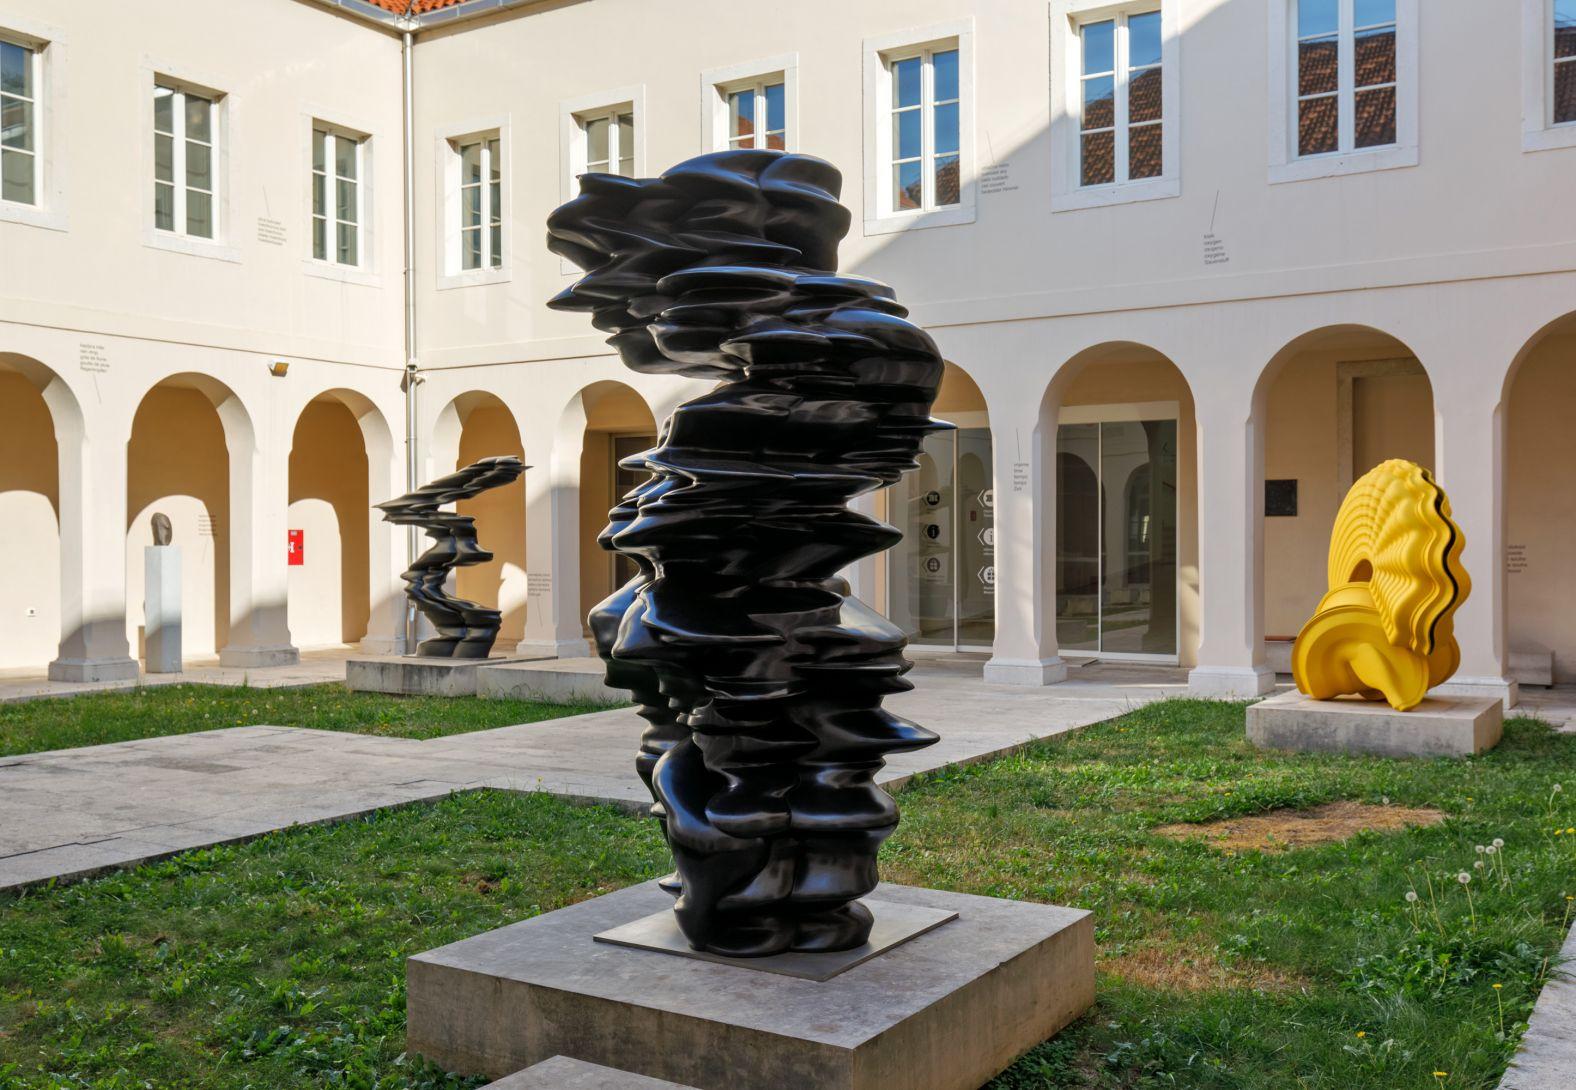 Tony Cragg - Art Gallery Kula, Split